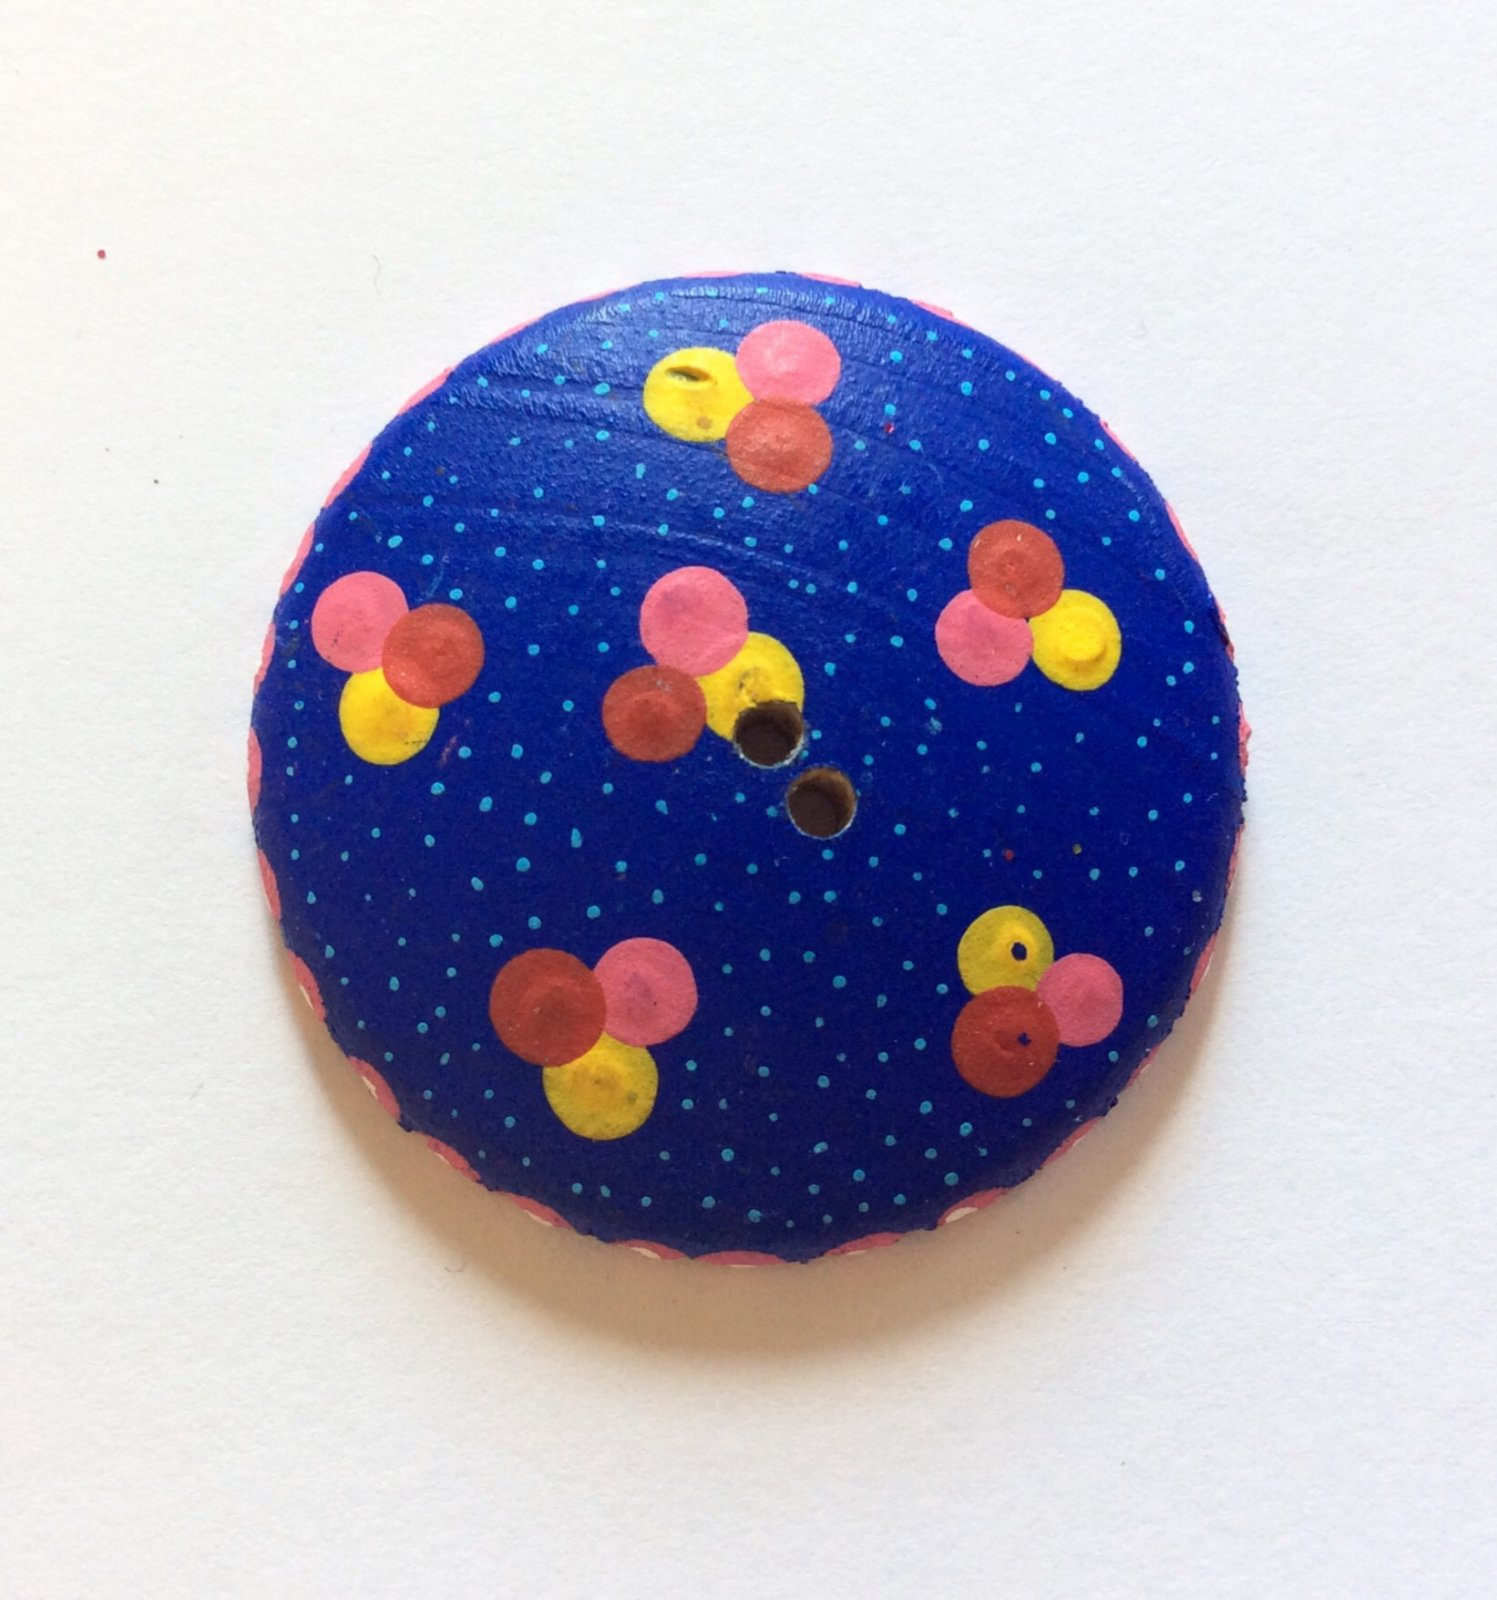 Oaxacan Artist Signed Hand Painted Sewing Button Oaxaca Mexico Folk Art Blue